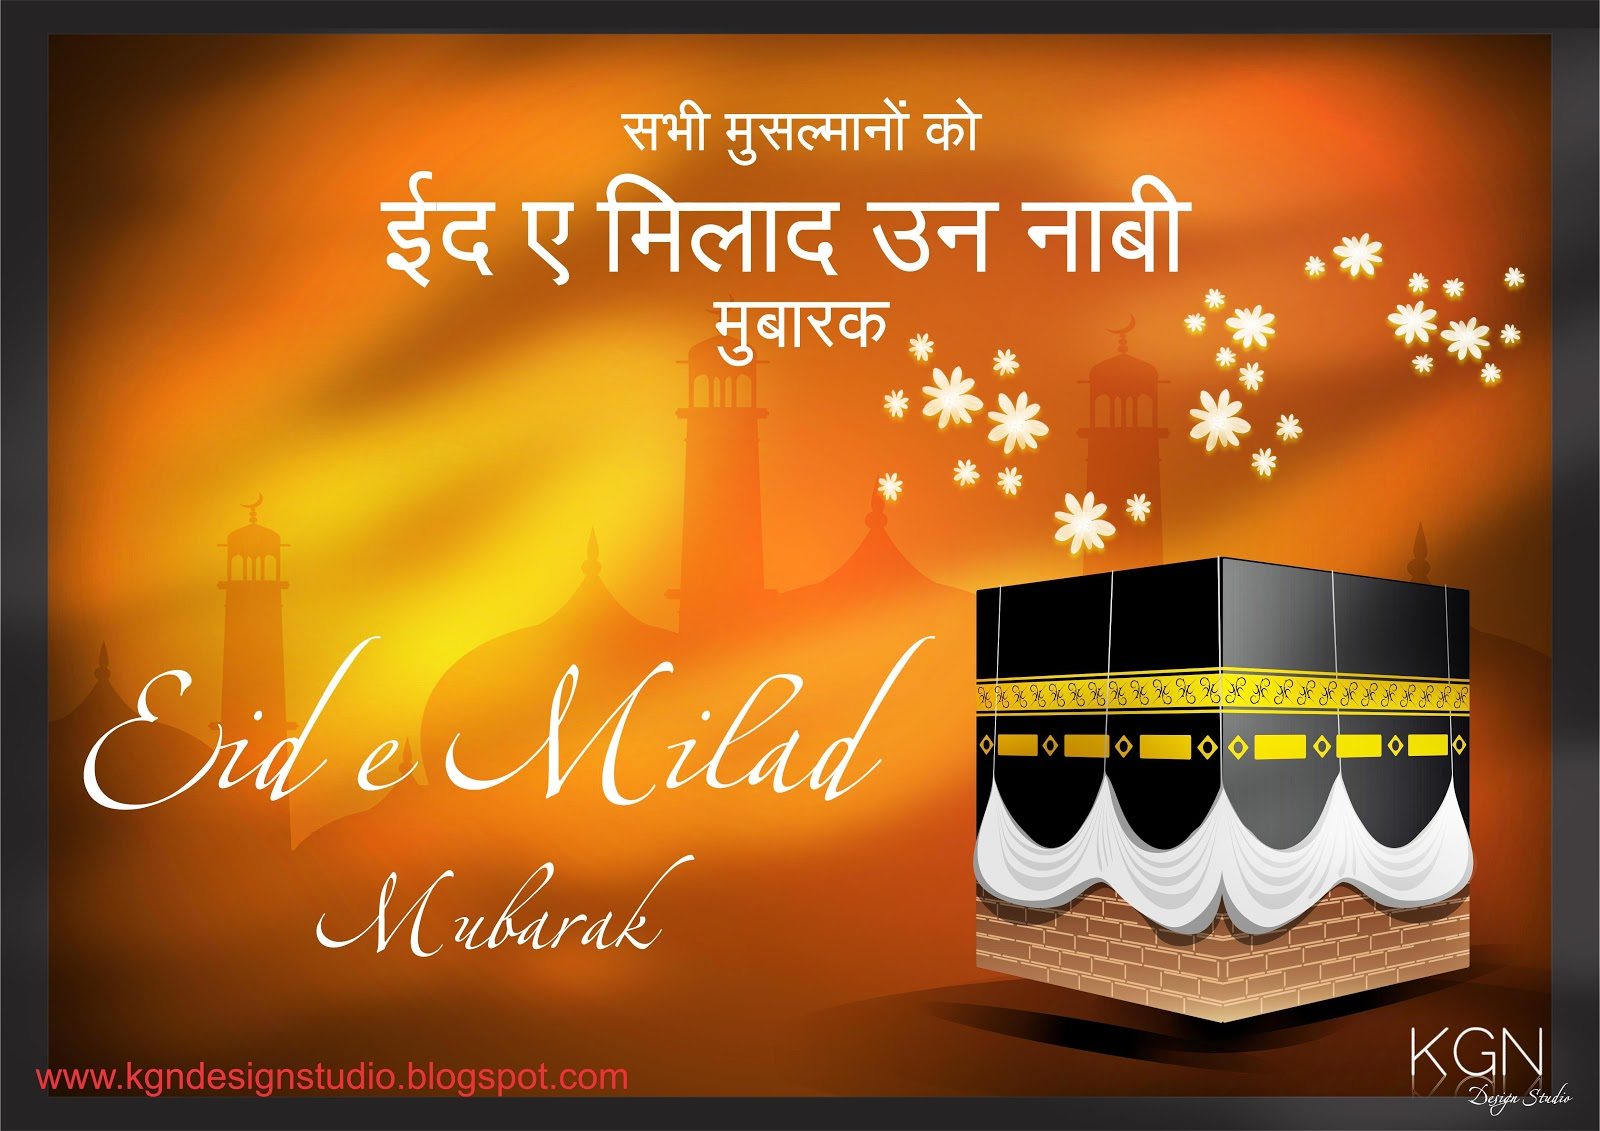 http://1.bp.blogspot.com/-_Wj8r5O2qww/UOgPnbb1g_I/AAAAAAAACWA/qVNhNkSclIw/s1600/Eid-Milad-20.jpg